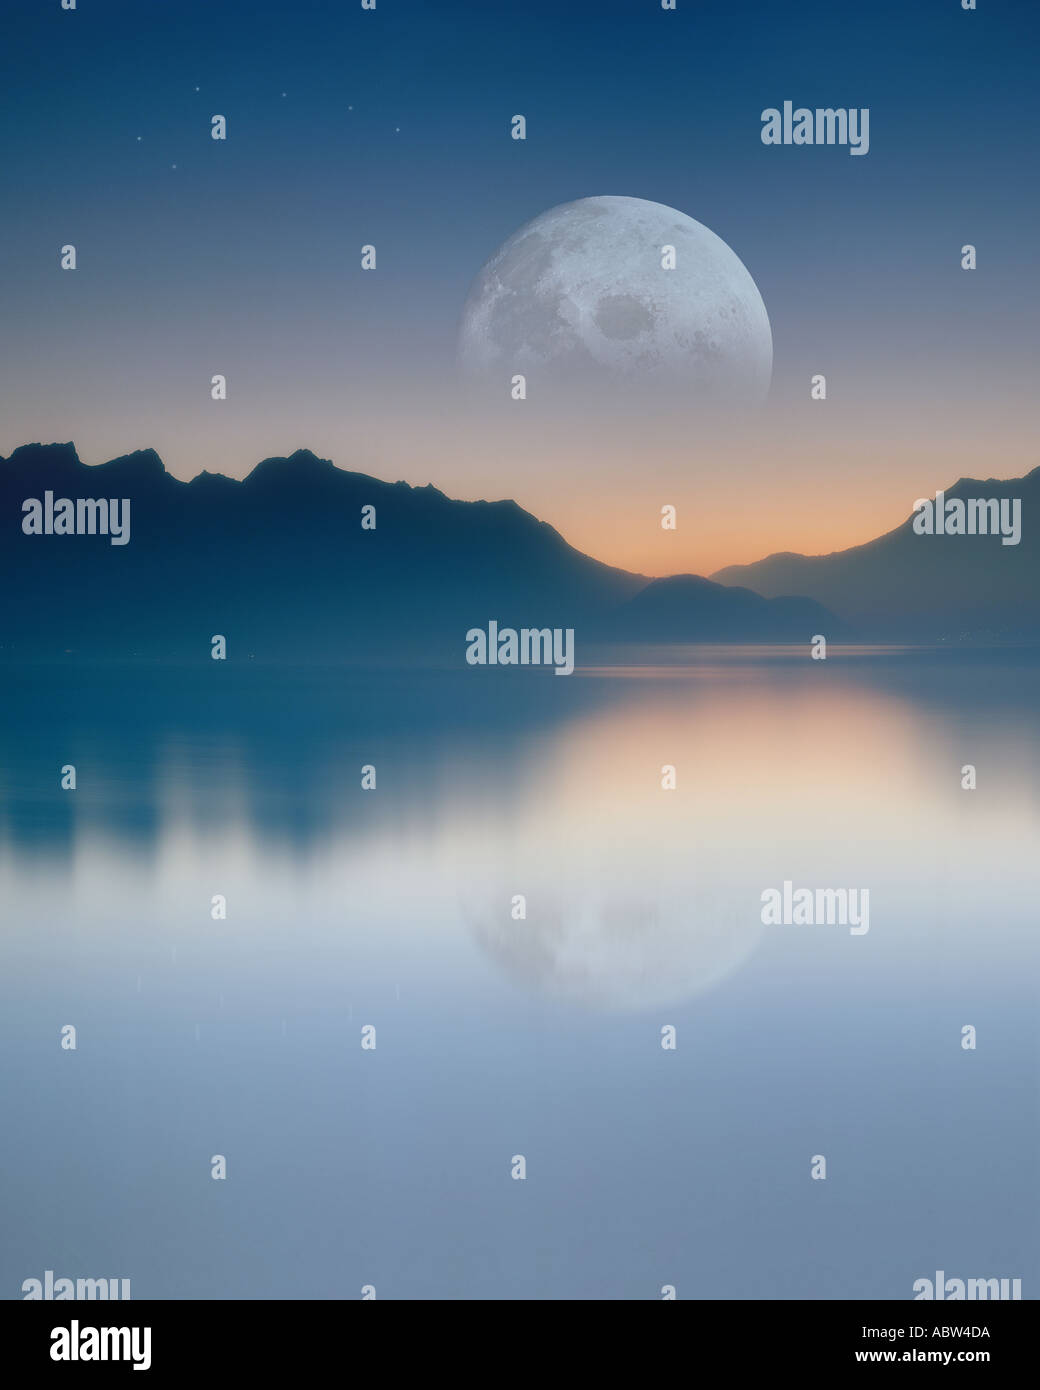 CH - VAUD: Moon over Lake Geneva - Stock Image